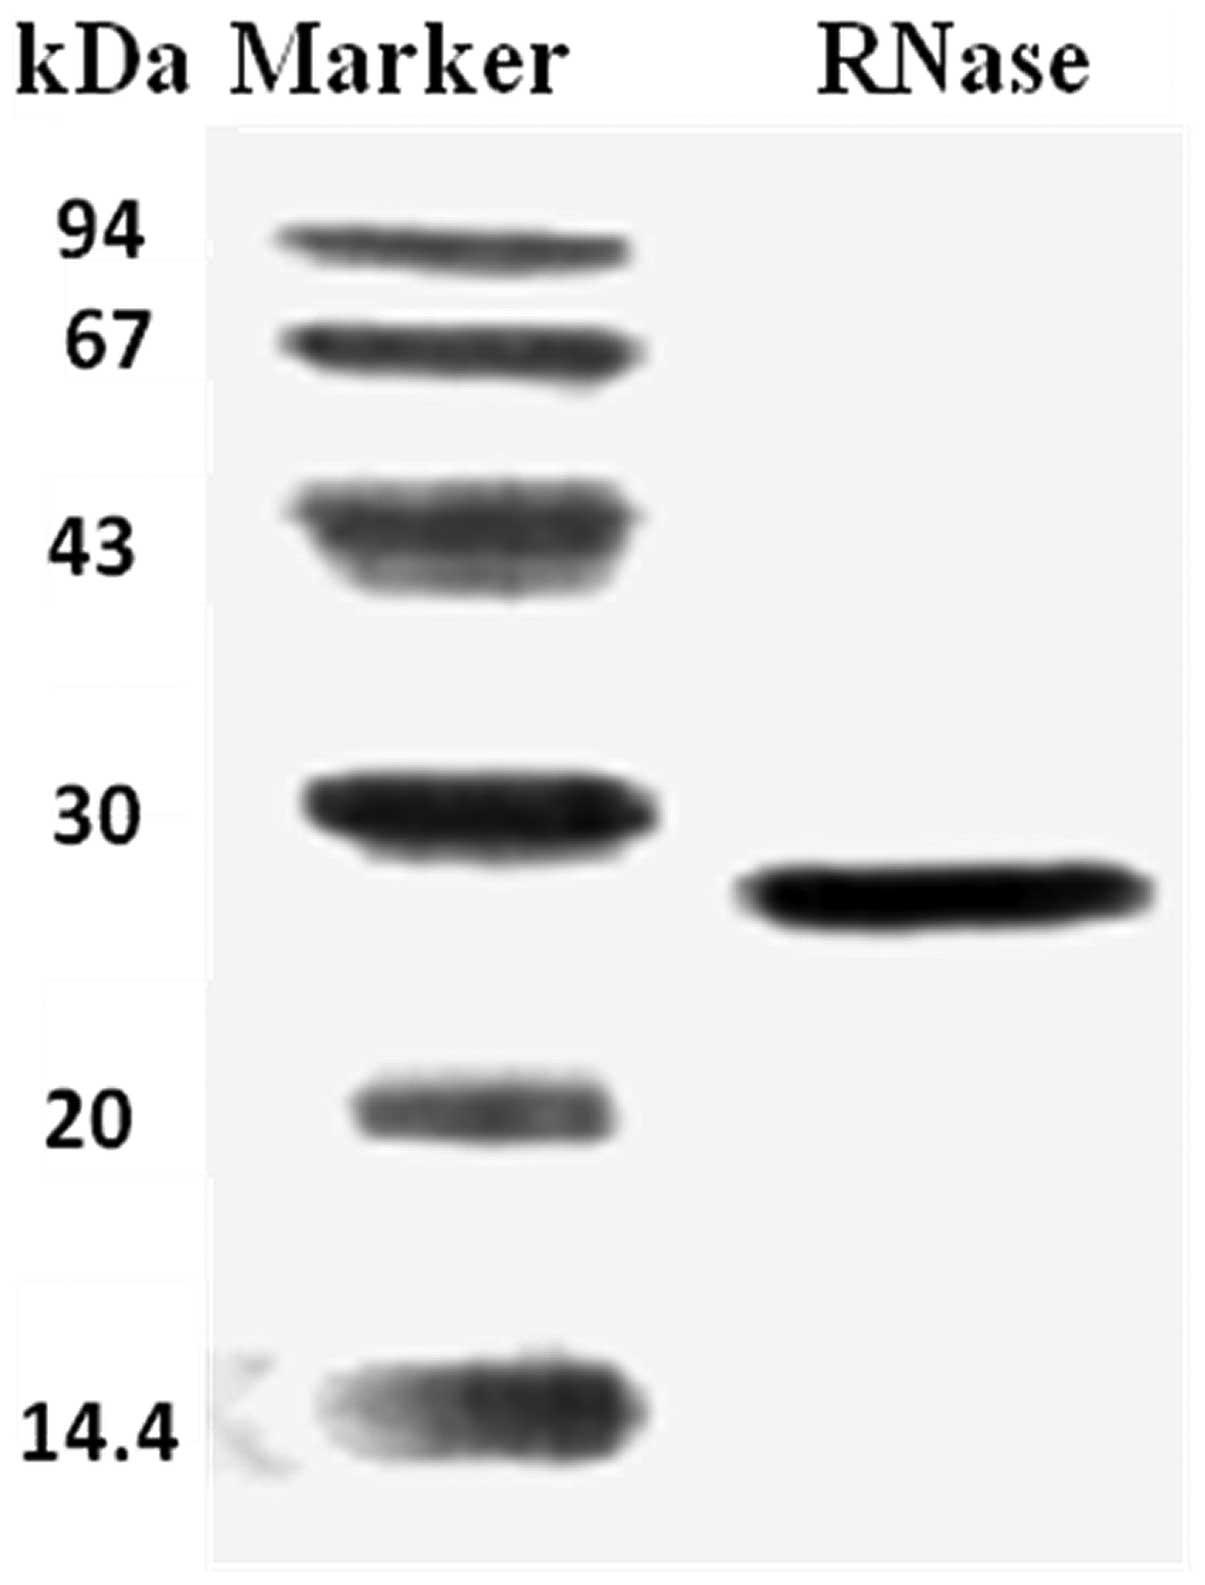 A Novel Ribonuclease With Antiproliferative Activity Toward Leukemia And Lymphoma Cells And Hiv